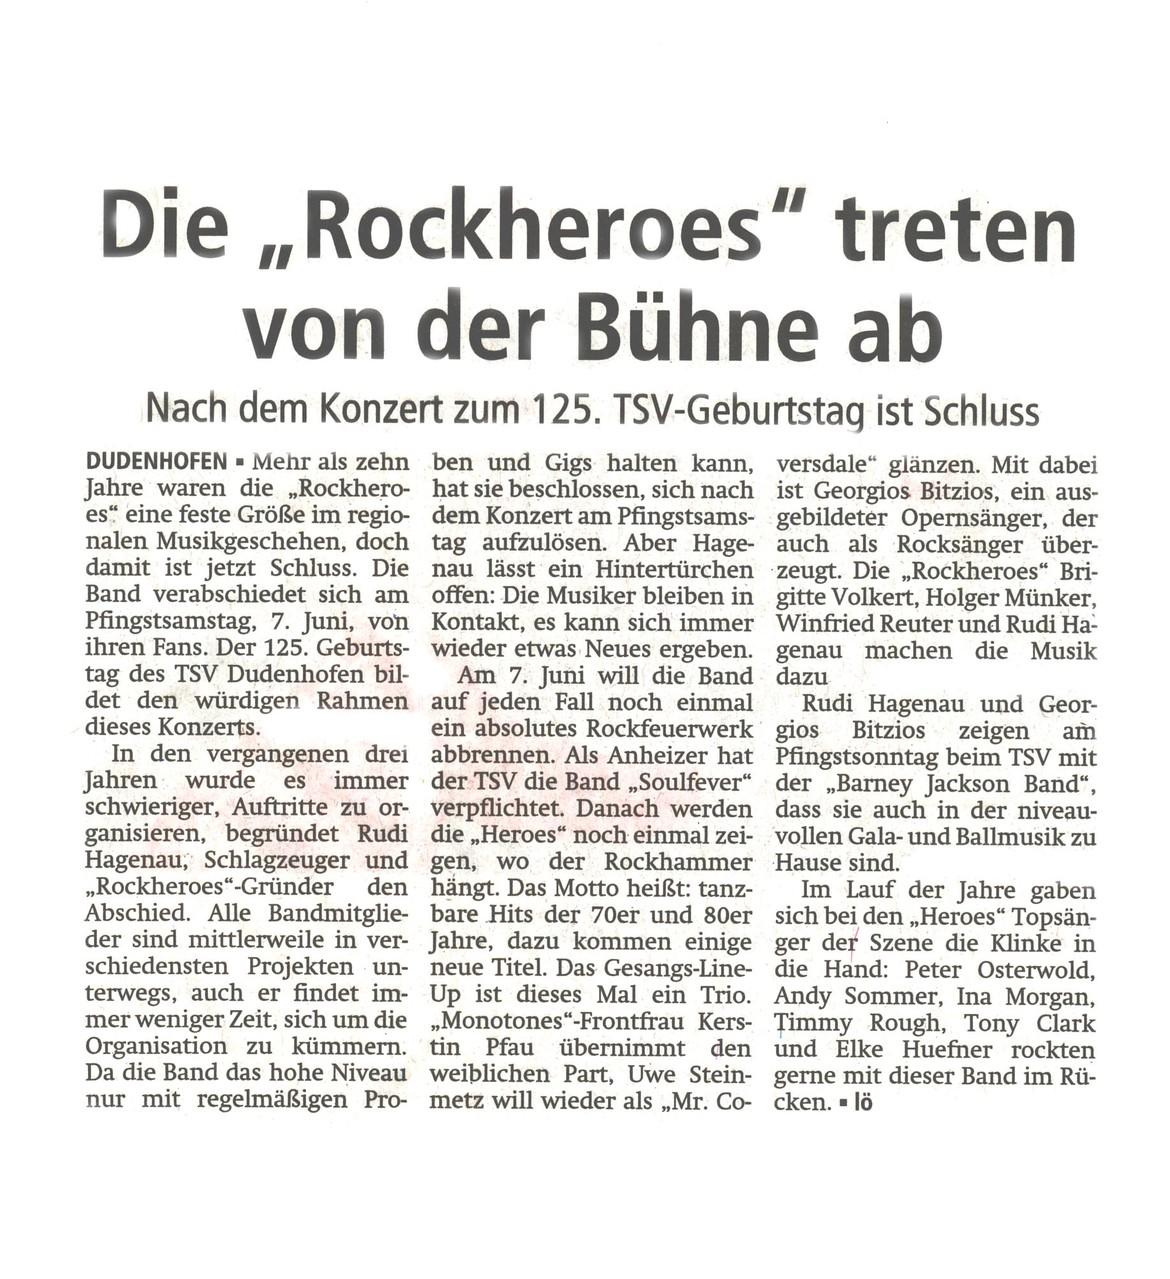 Offenbach Post, 26. Mai 2014